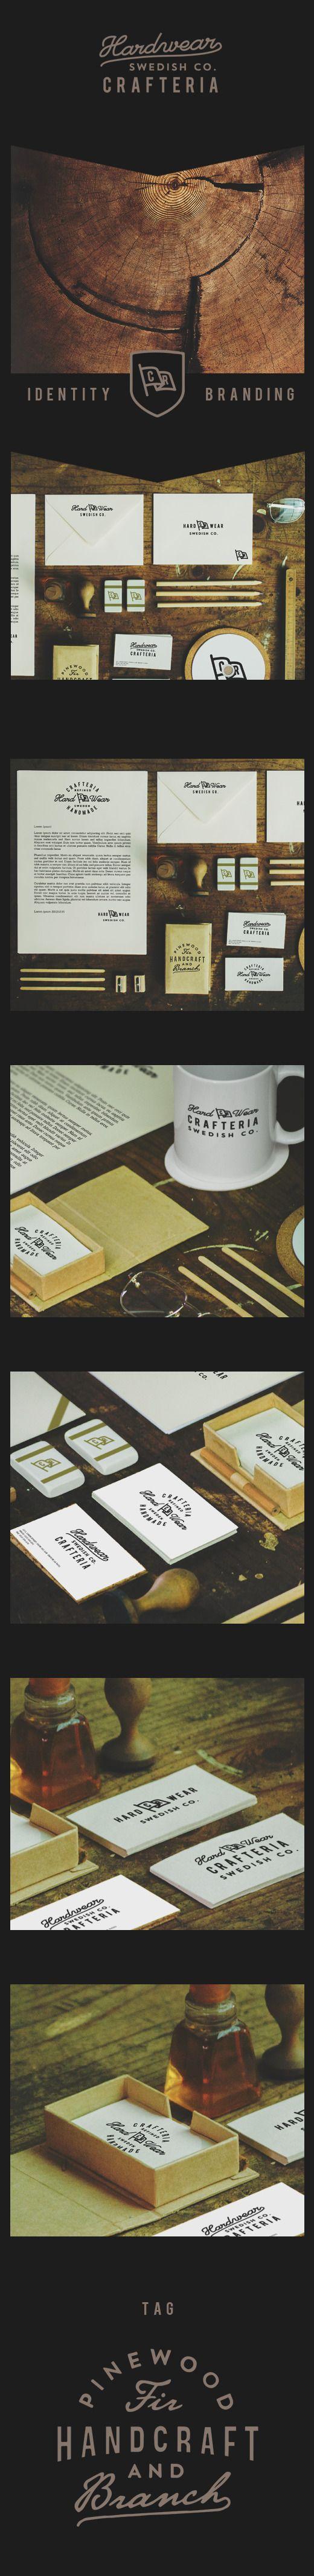 Hardwear Swedish Co. Crafteria branding | Authentic China Identity by Yohanes Raymond